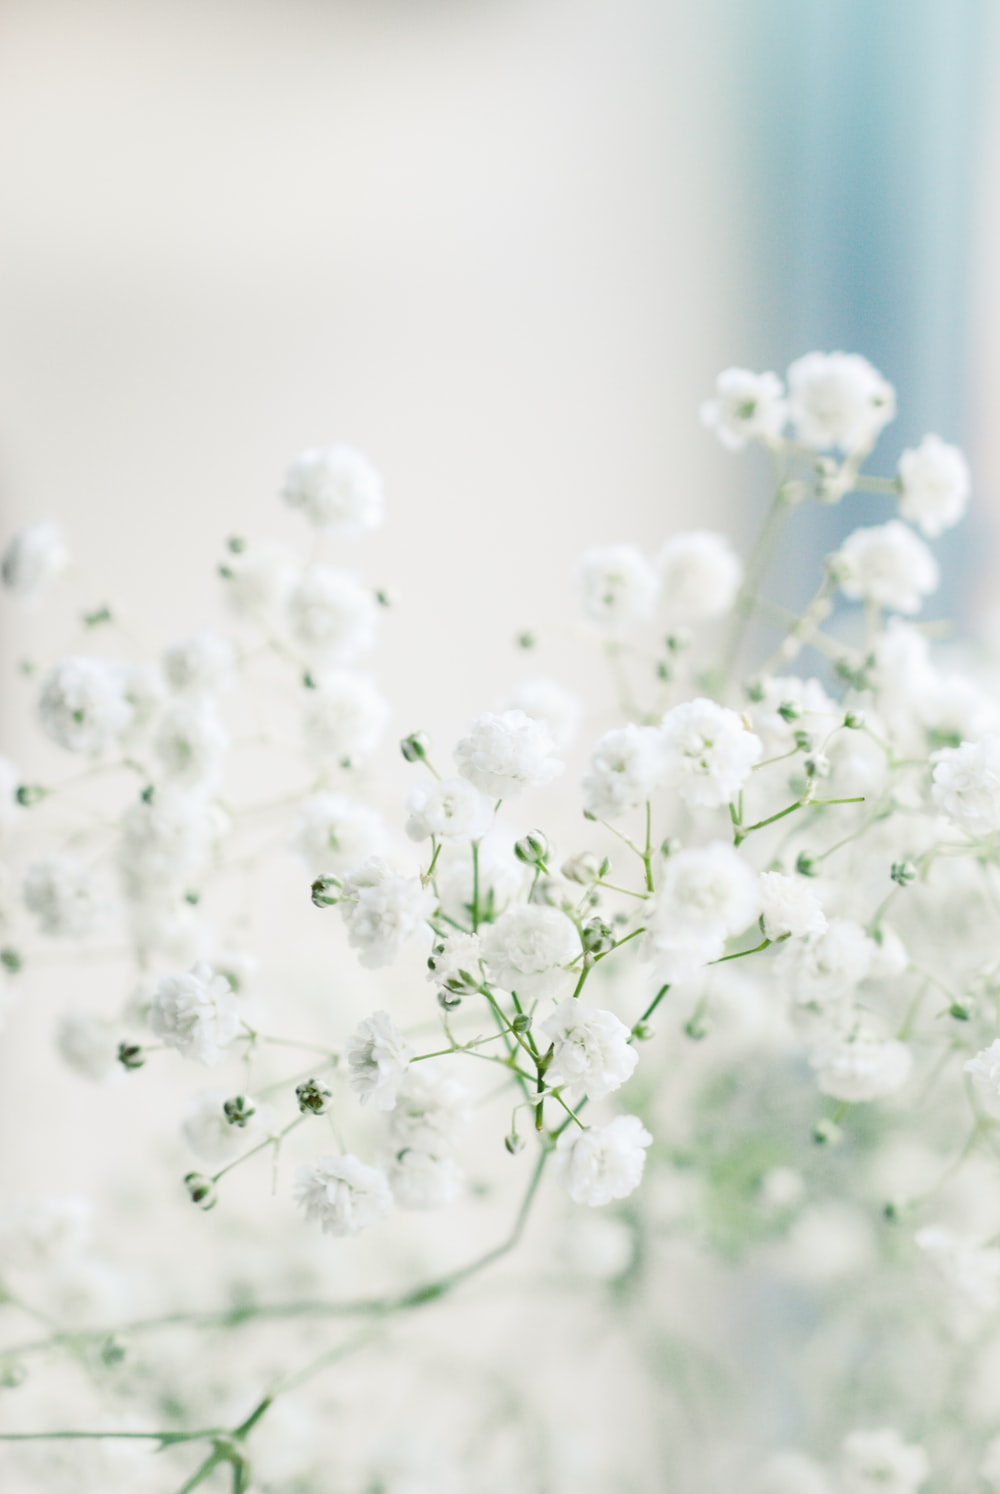 white flowers in macro lens